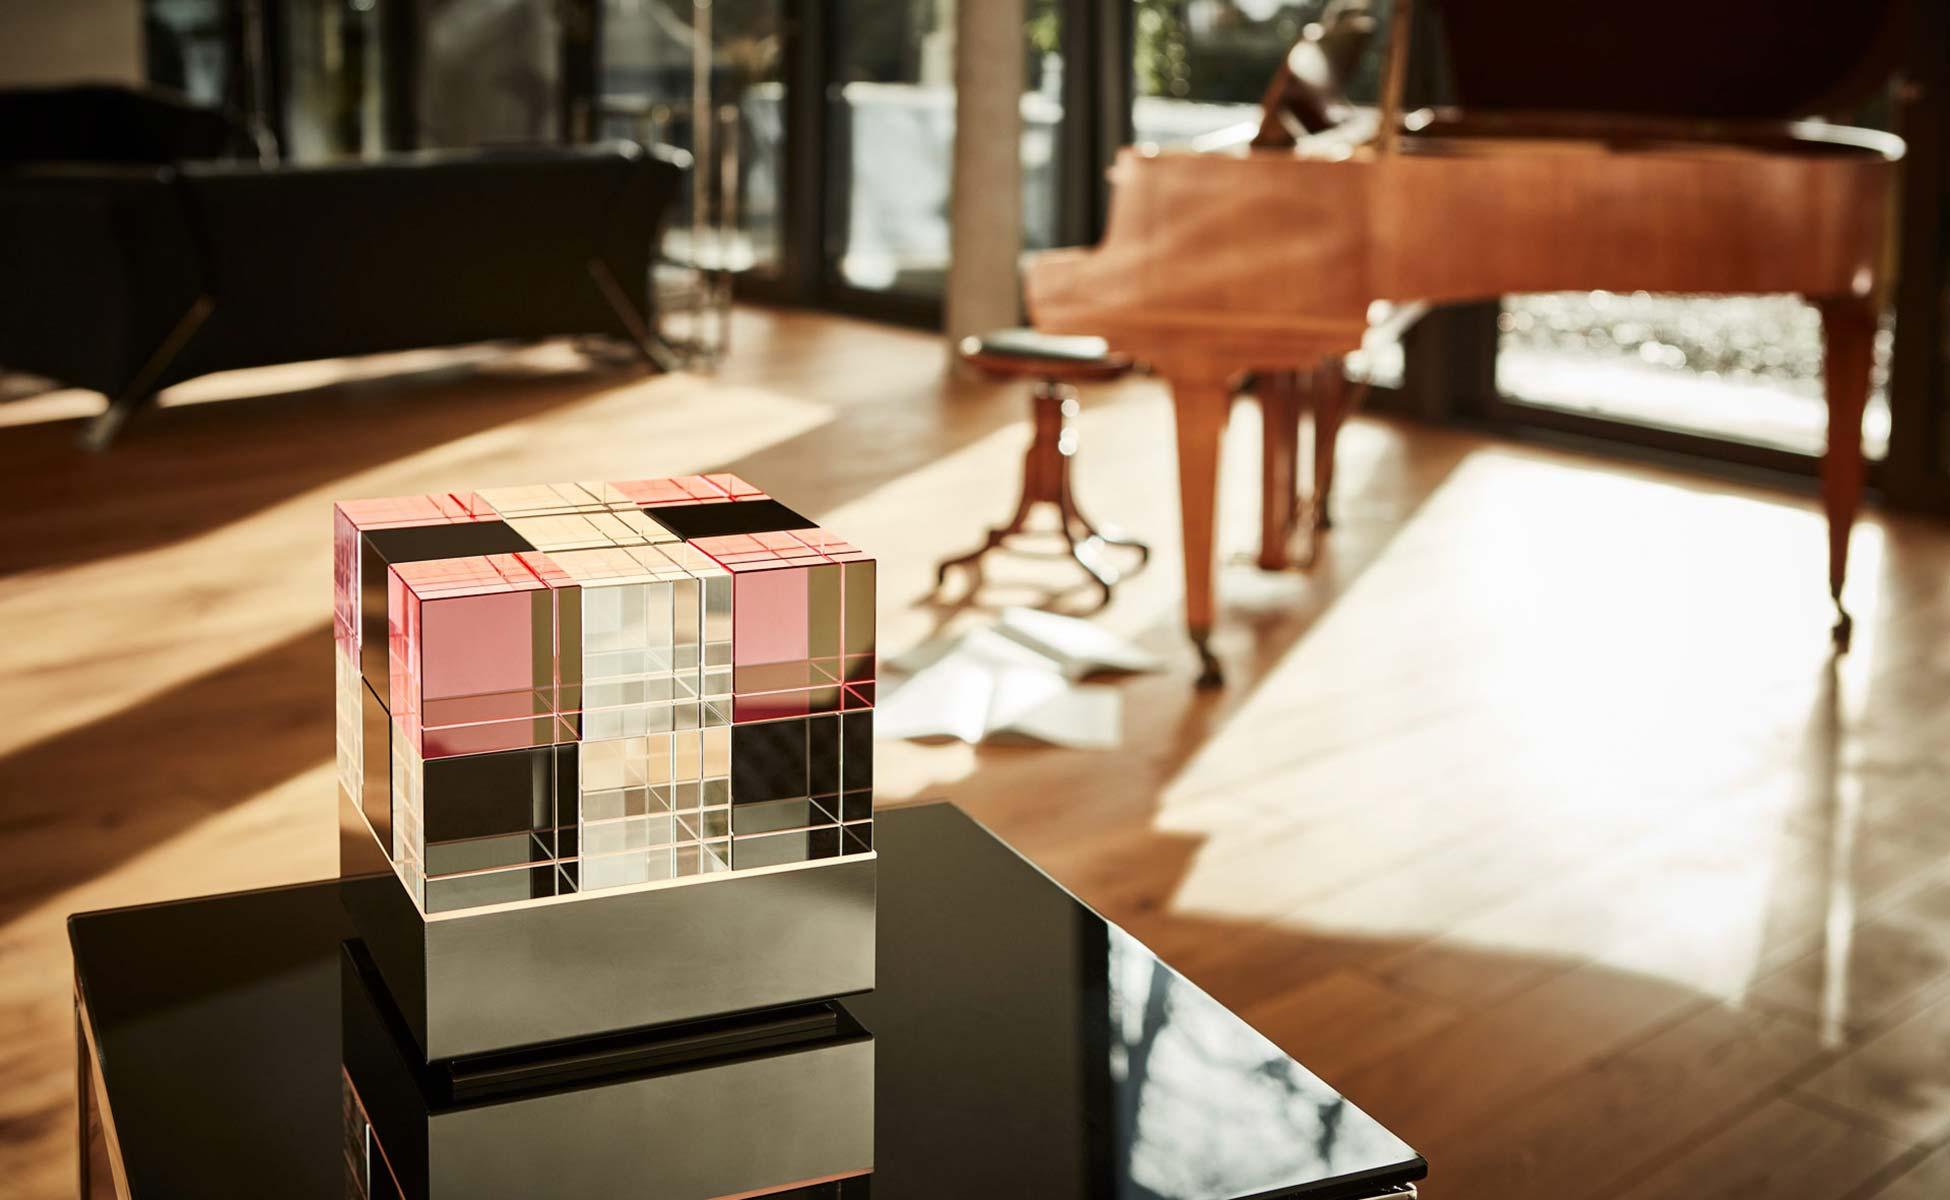 TECNOLUMEN Cubelight Leuchte bei steidten+ in Berlin